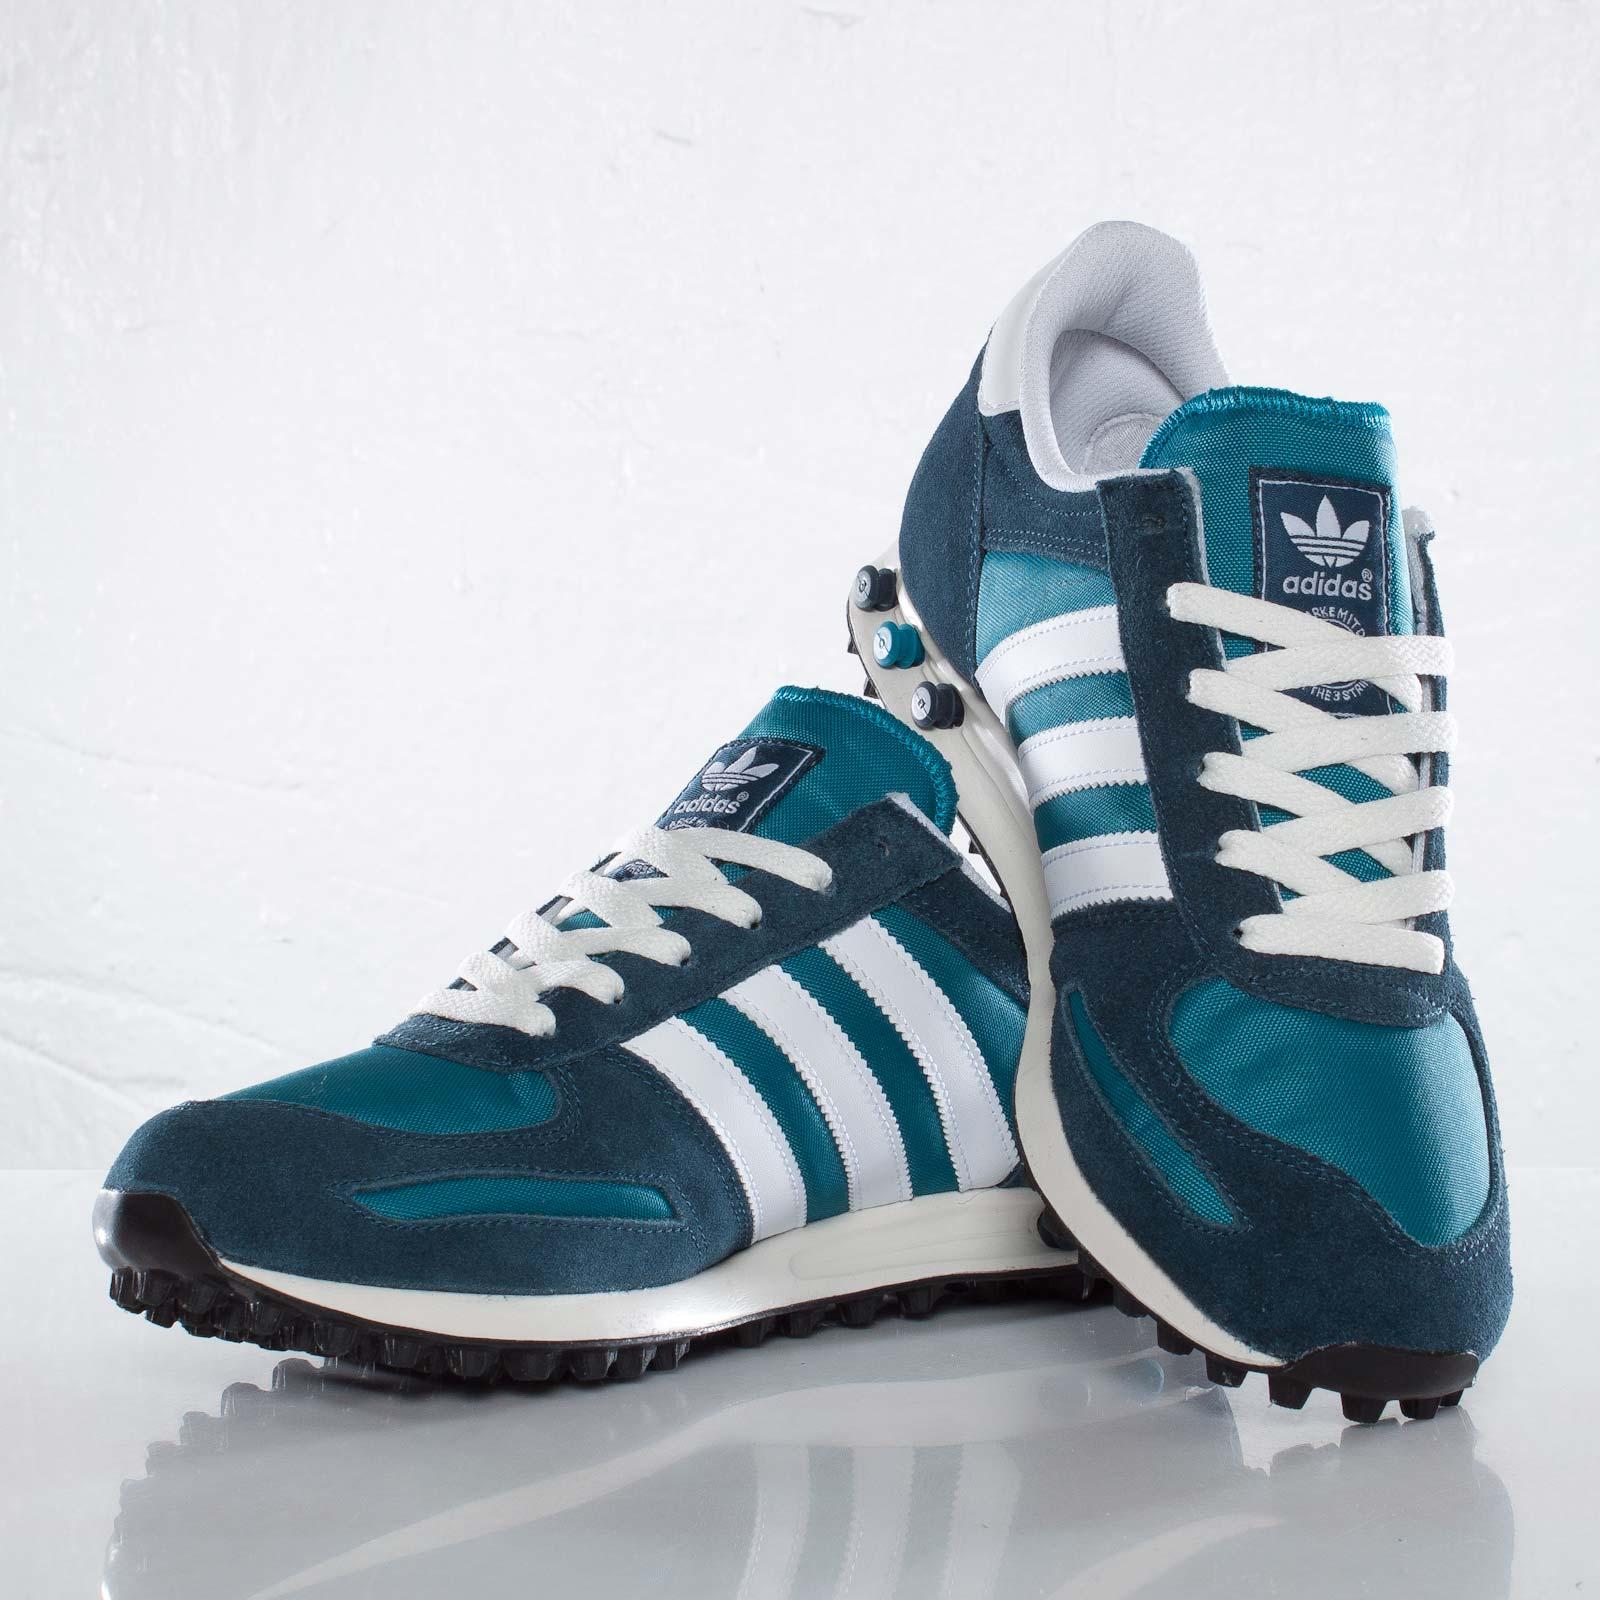 adidas LA Trainer - Q20744 - SNS | sneakers & streetwear online ...